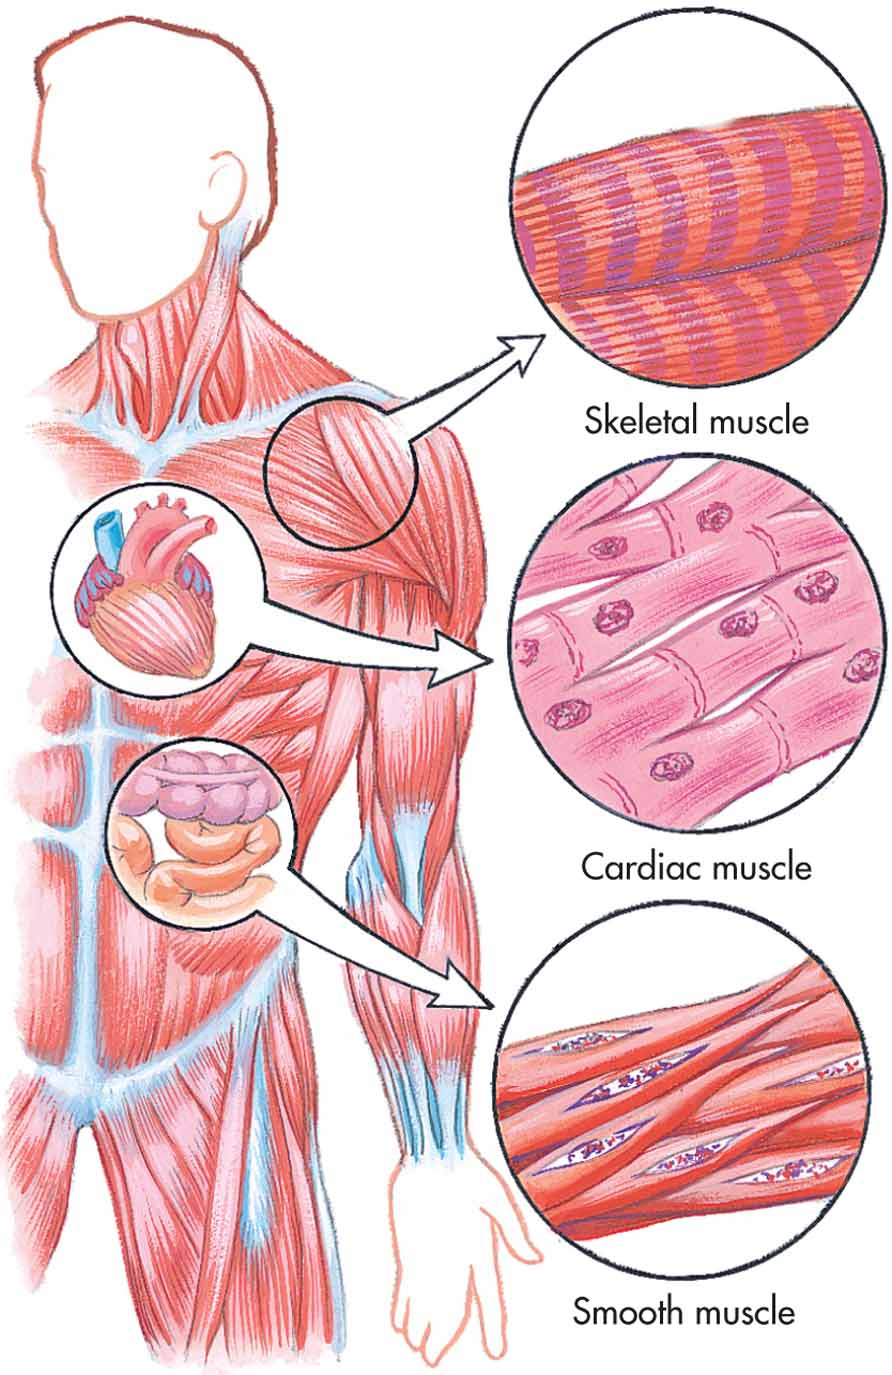 Ciencias 4to grado: Human Body Tissues